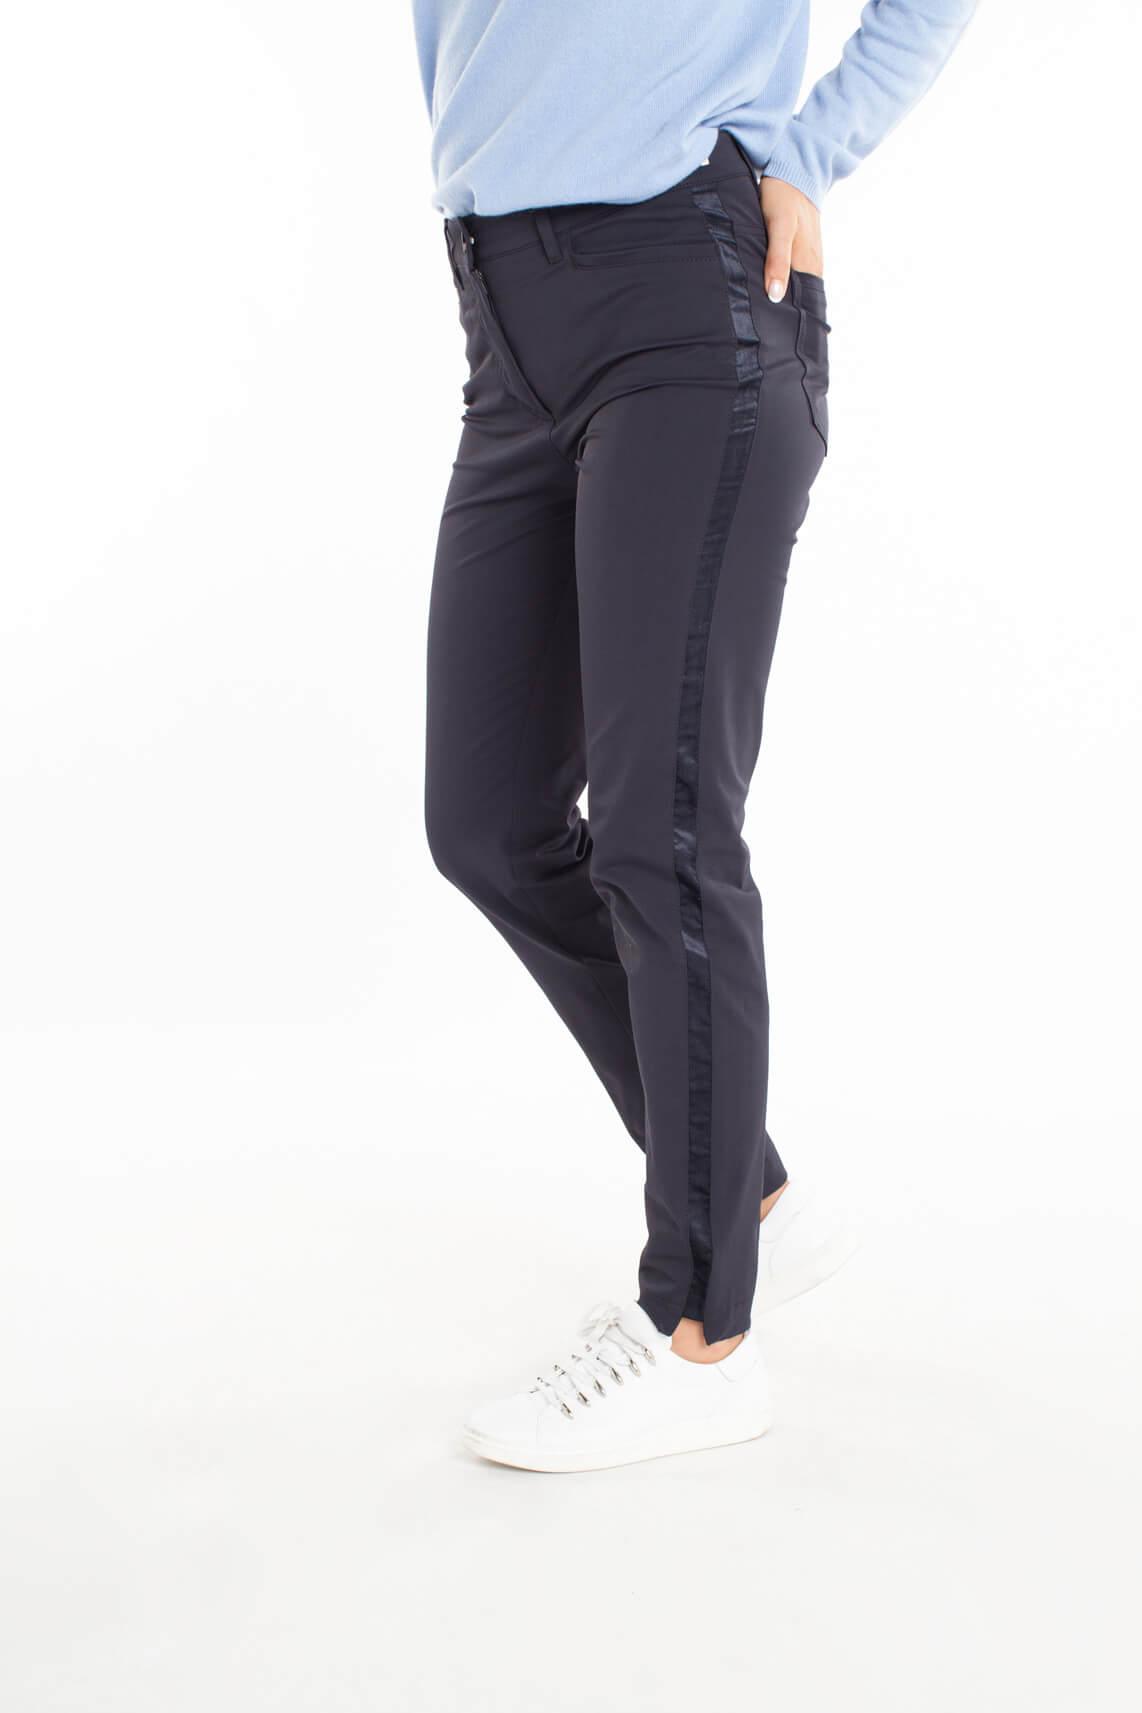 Rosner Dames Audrey pantalon met bies Blauw